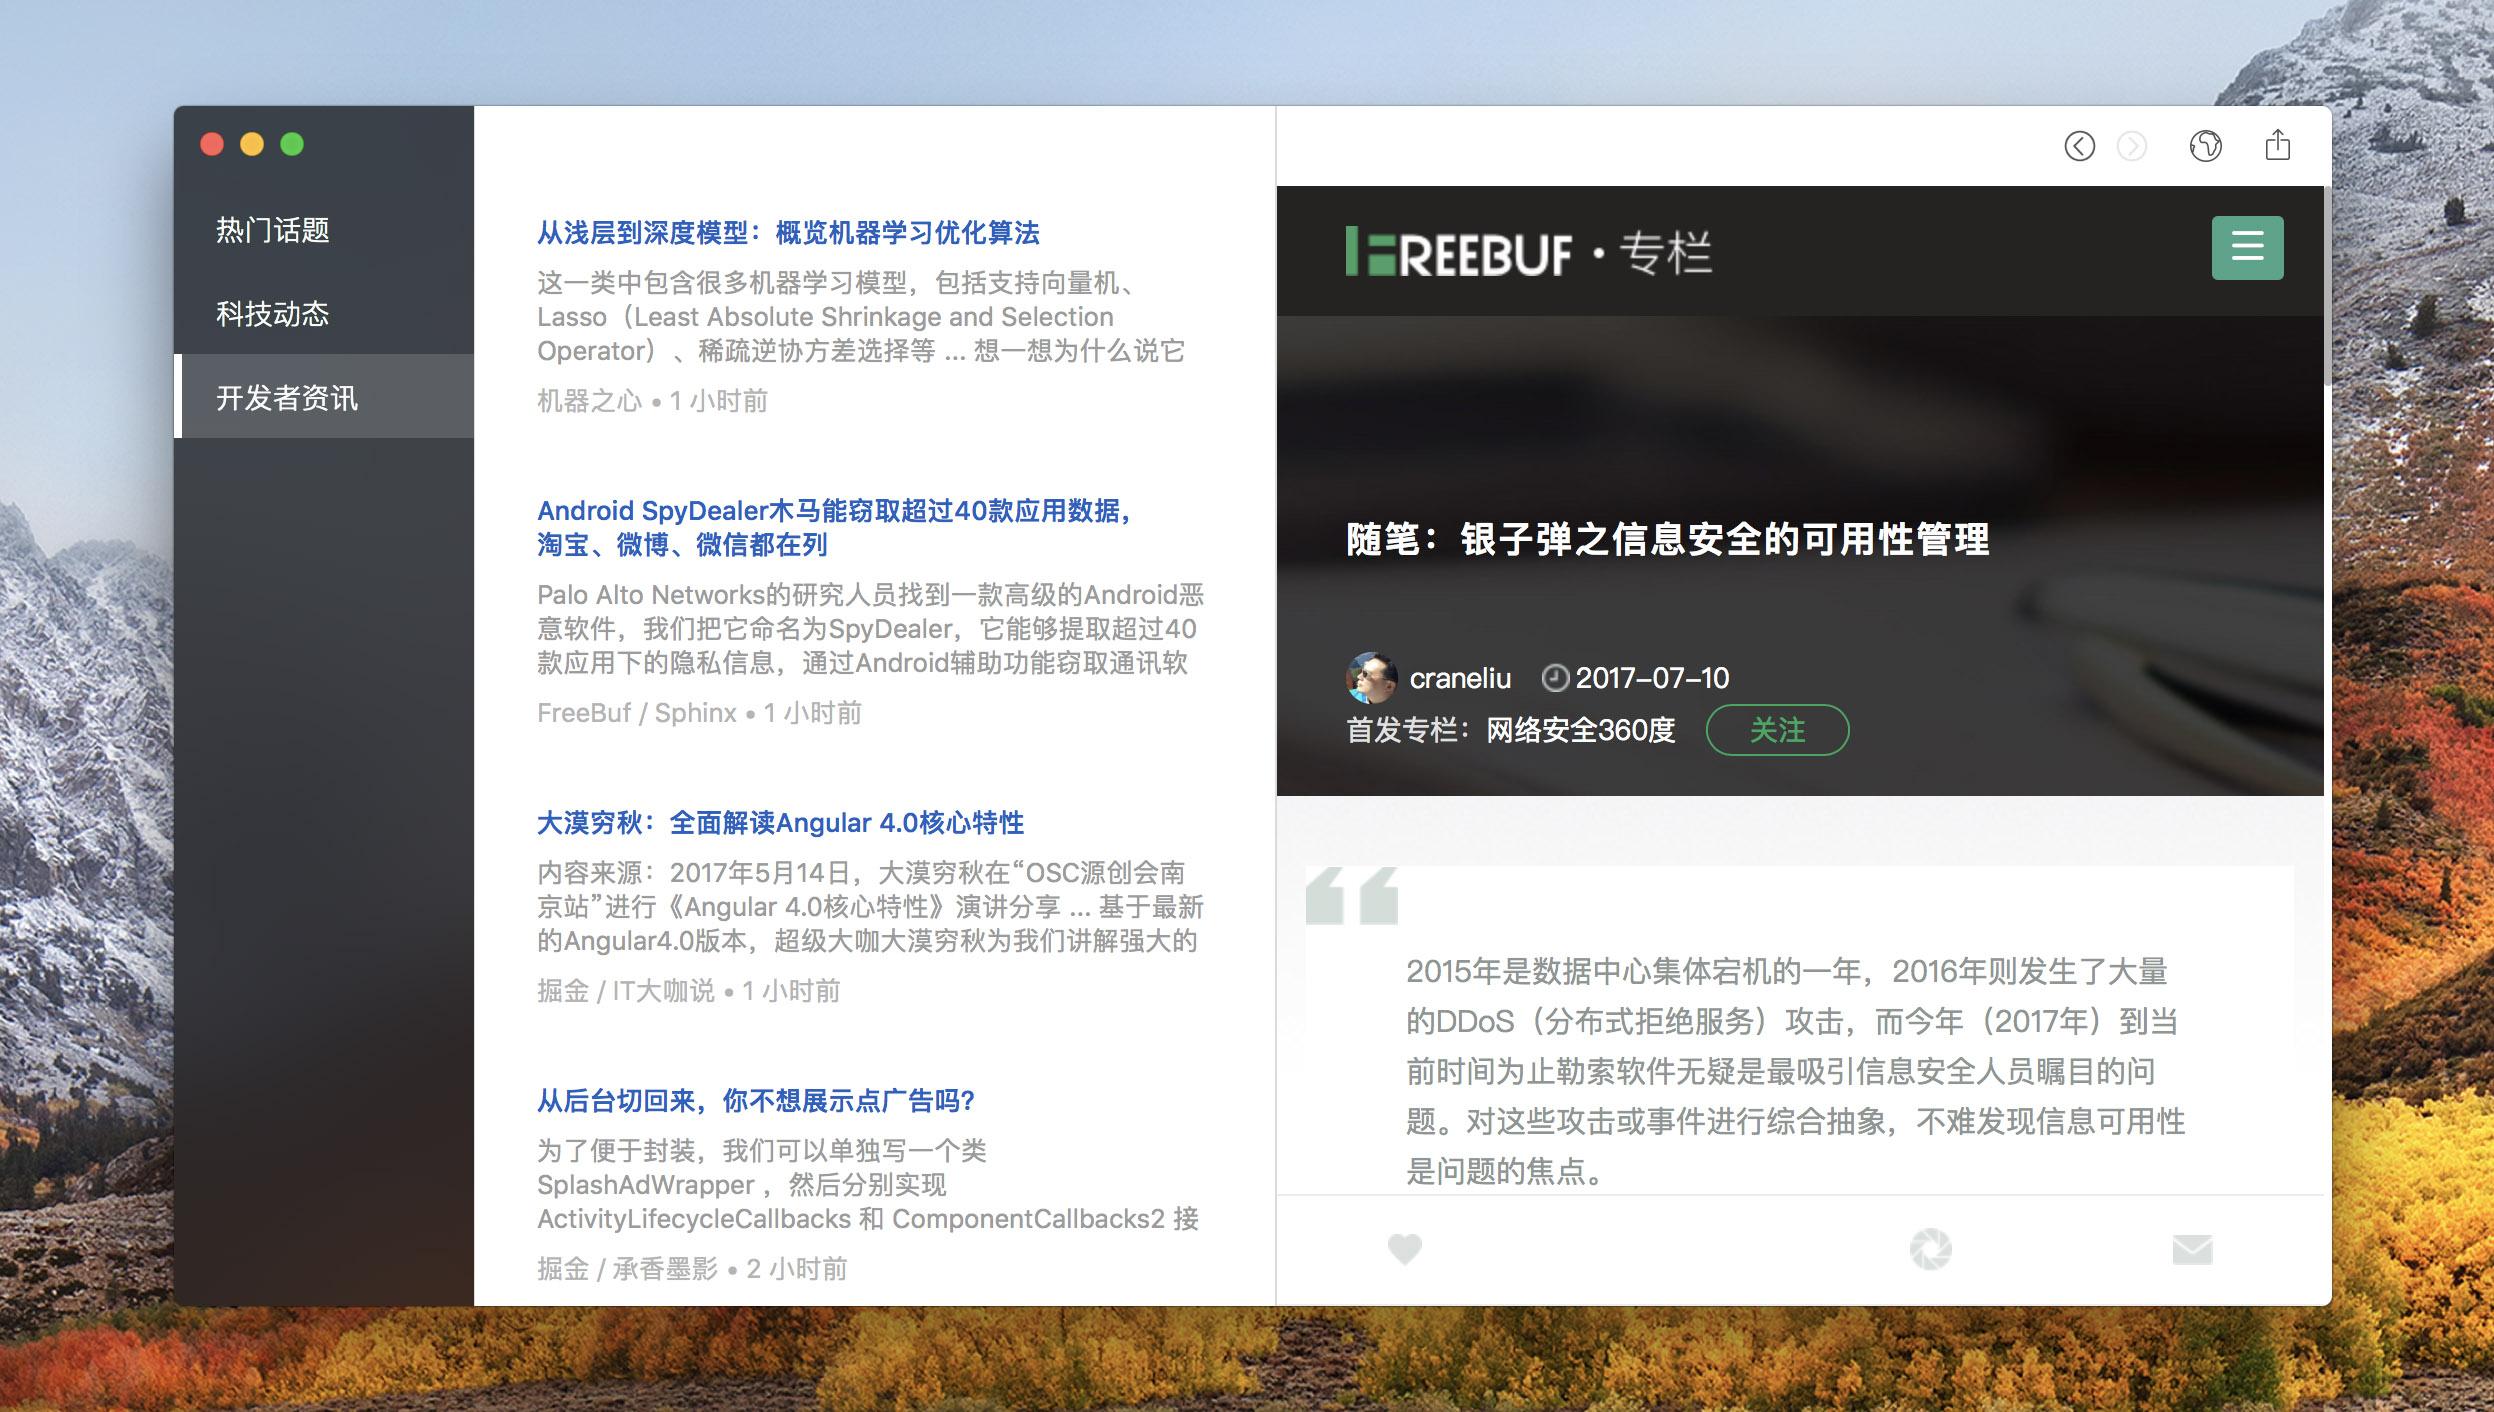 Readhub 第三方 macOS 客户端(图 @im61)